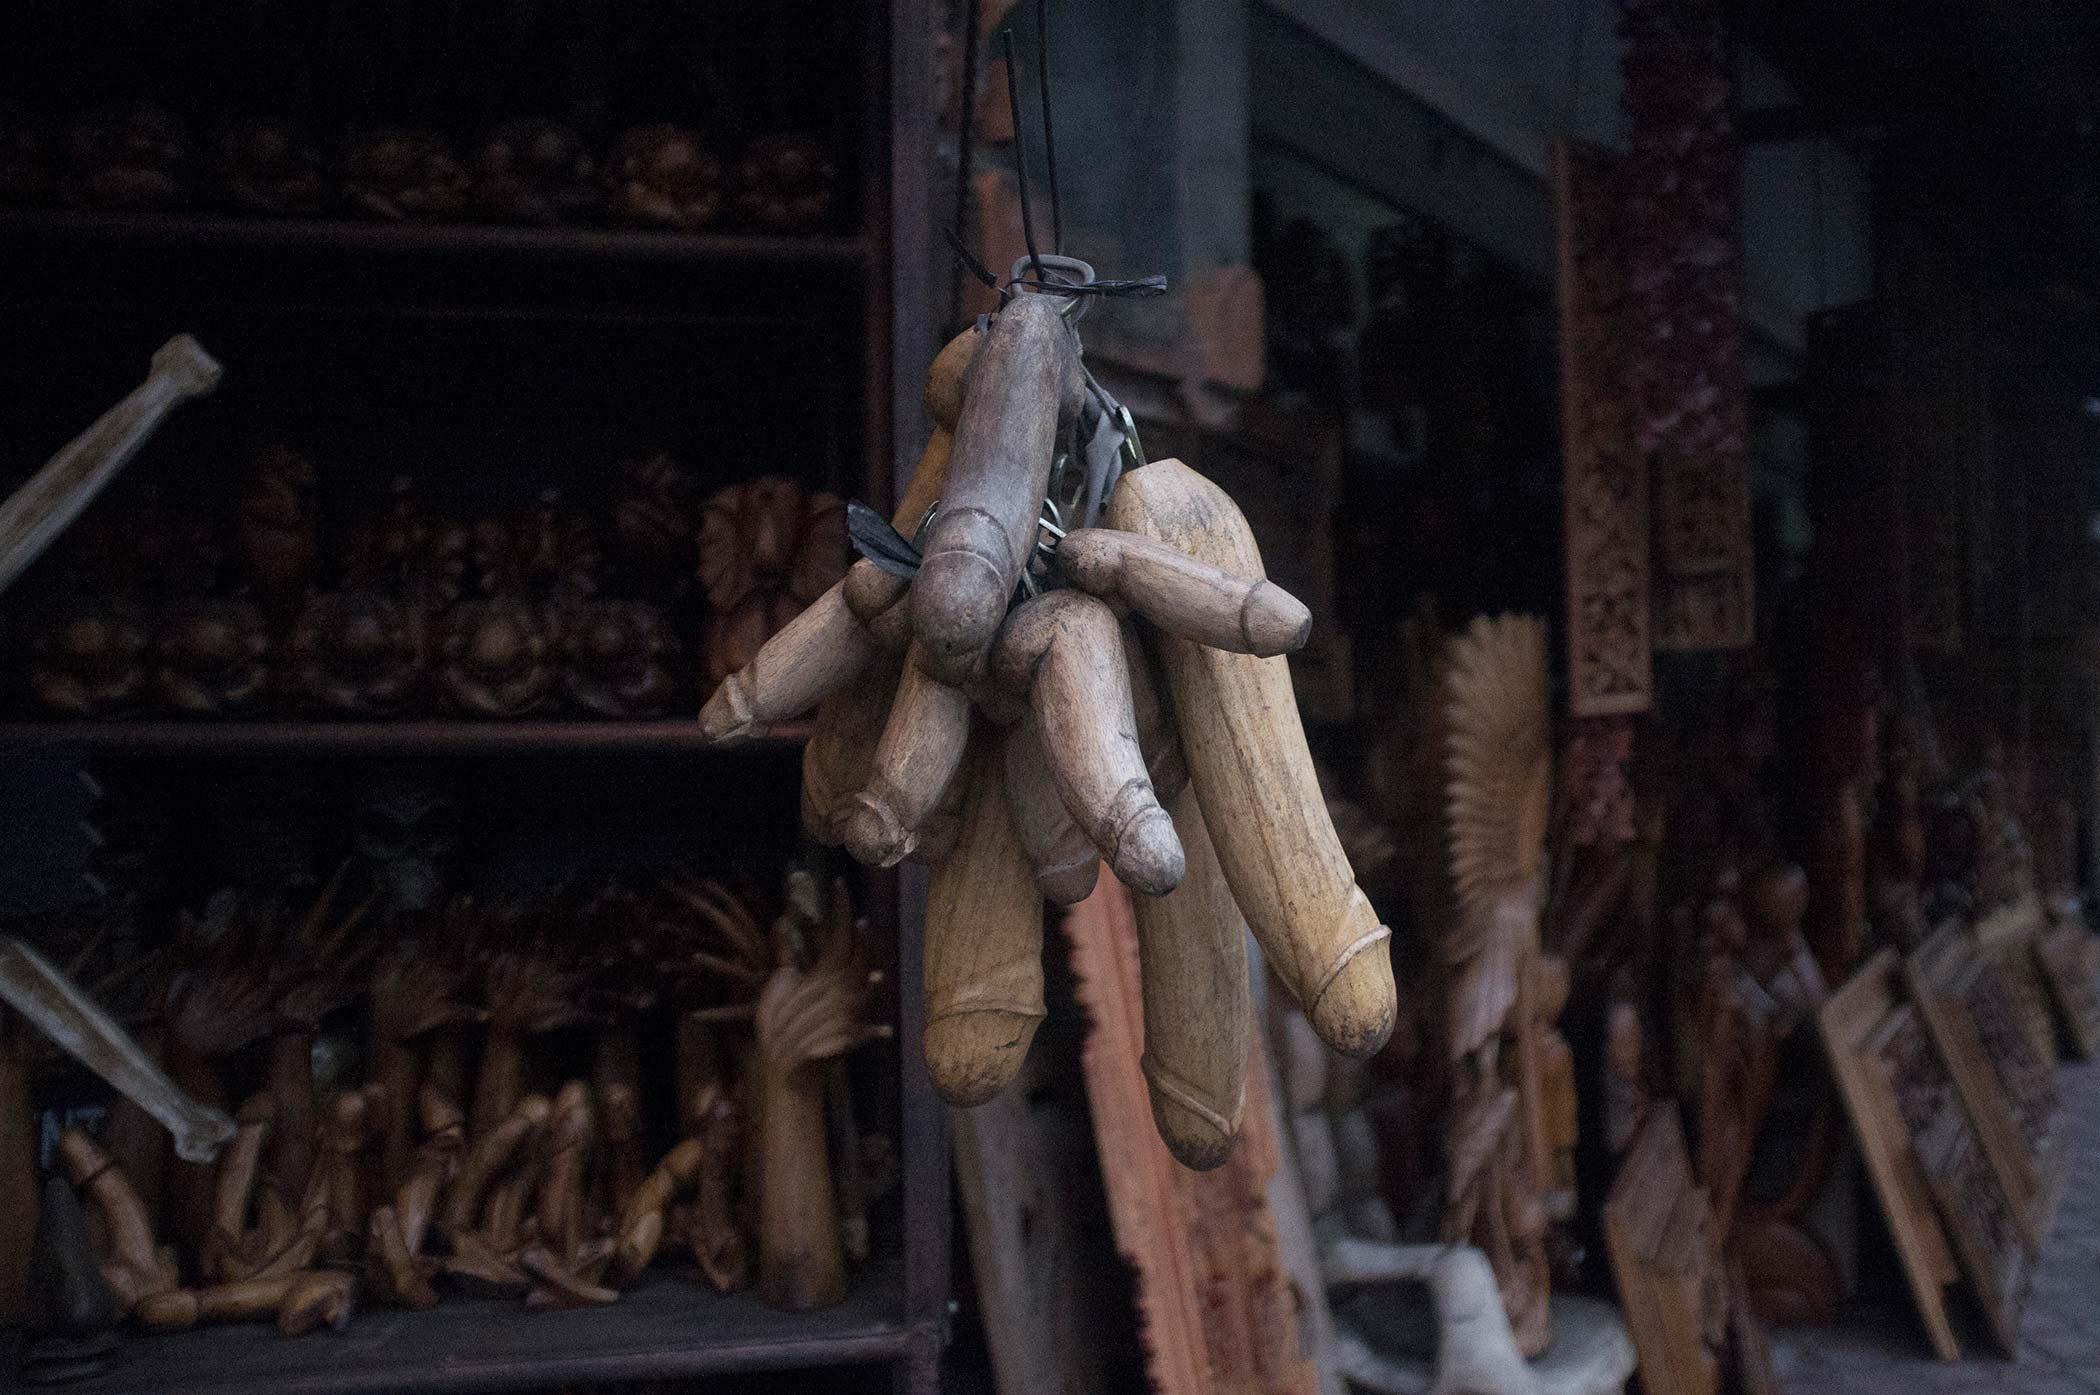 Balinese are great wood carvers. Wood carved dildo beer-openers.